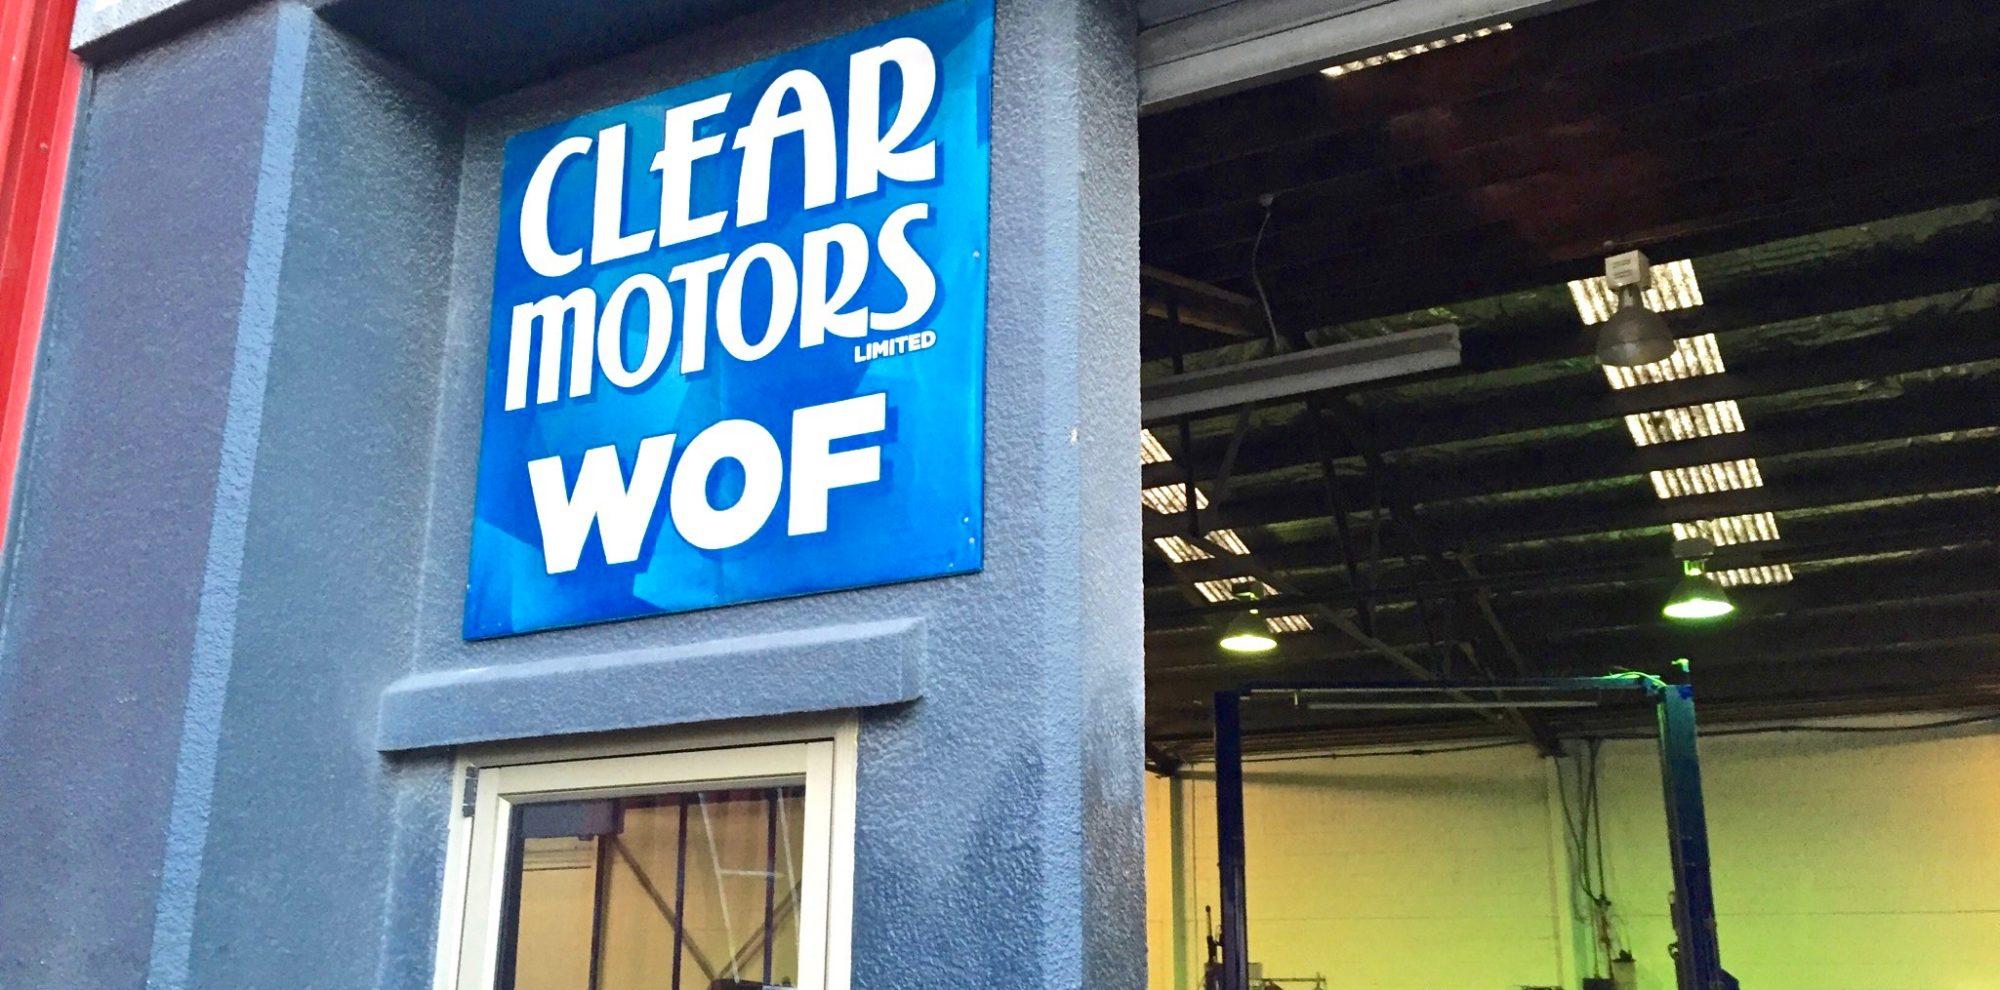 Clear Motors Ltd